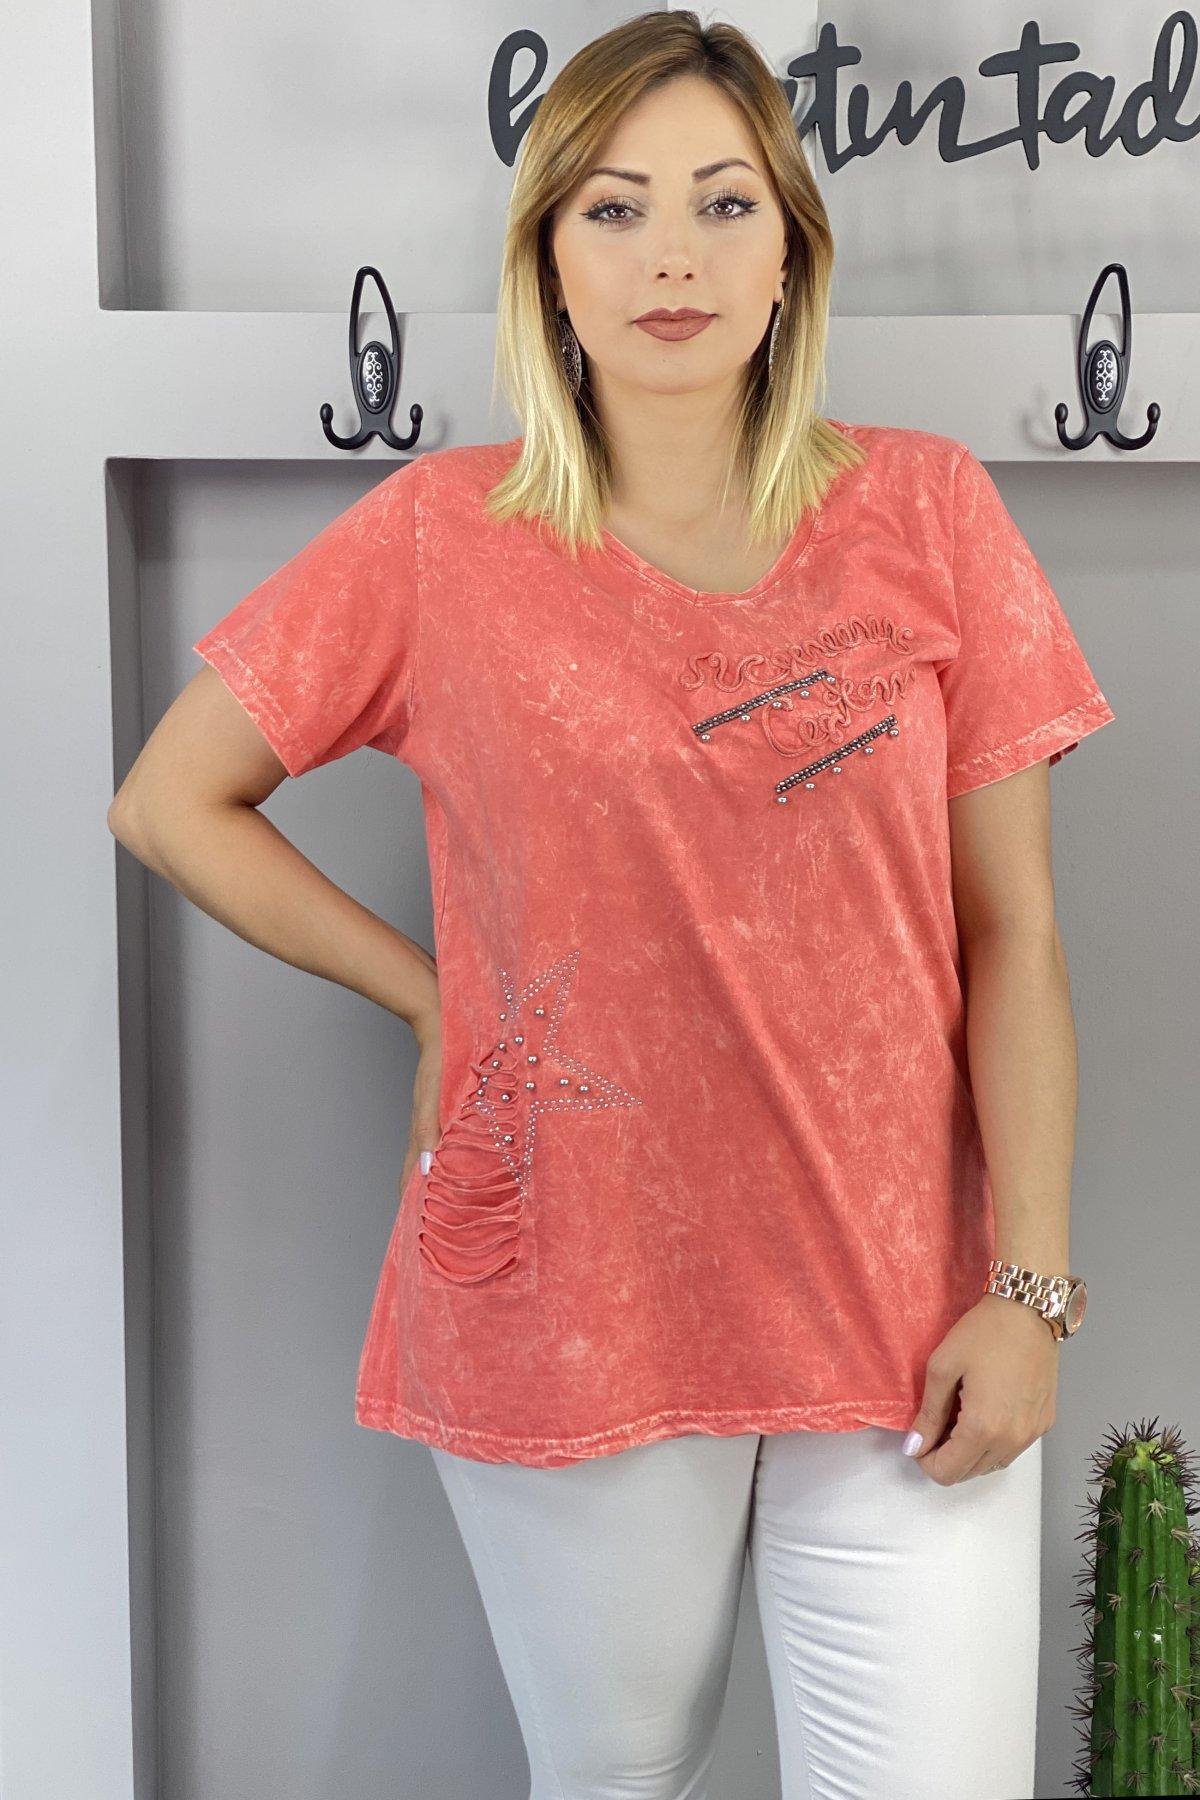 https://resim.chicbag.com.tr/p000669/yvr/yazi-ve-yildiz-detayli-t-shirt-01ce2ec495e4.jpg